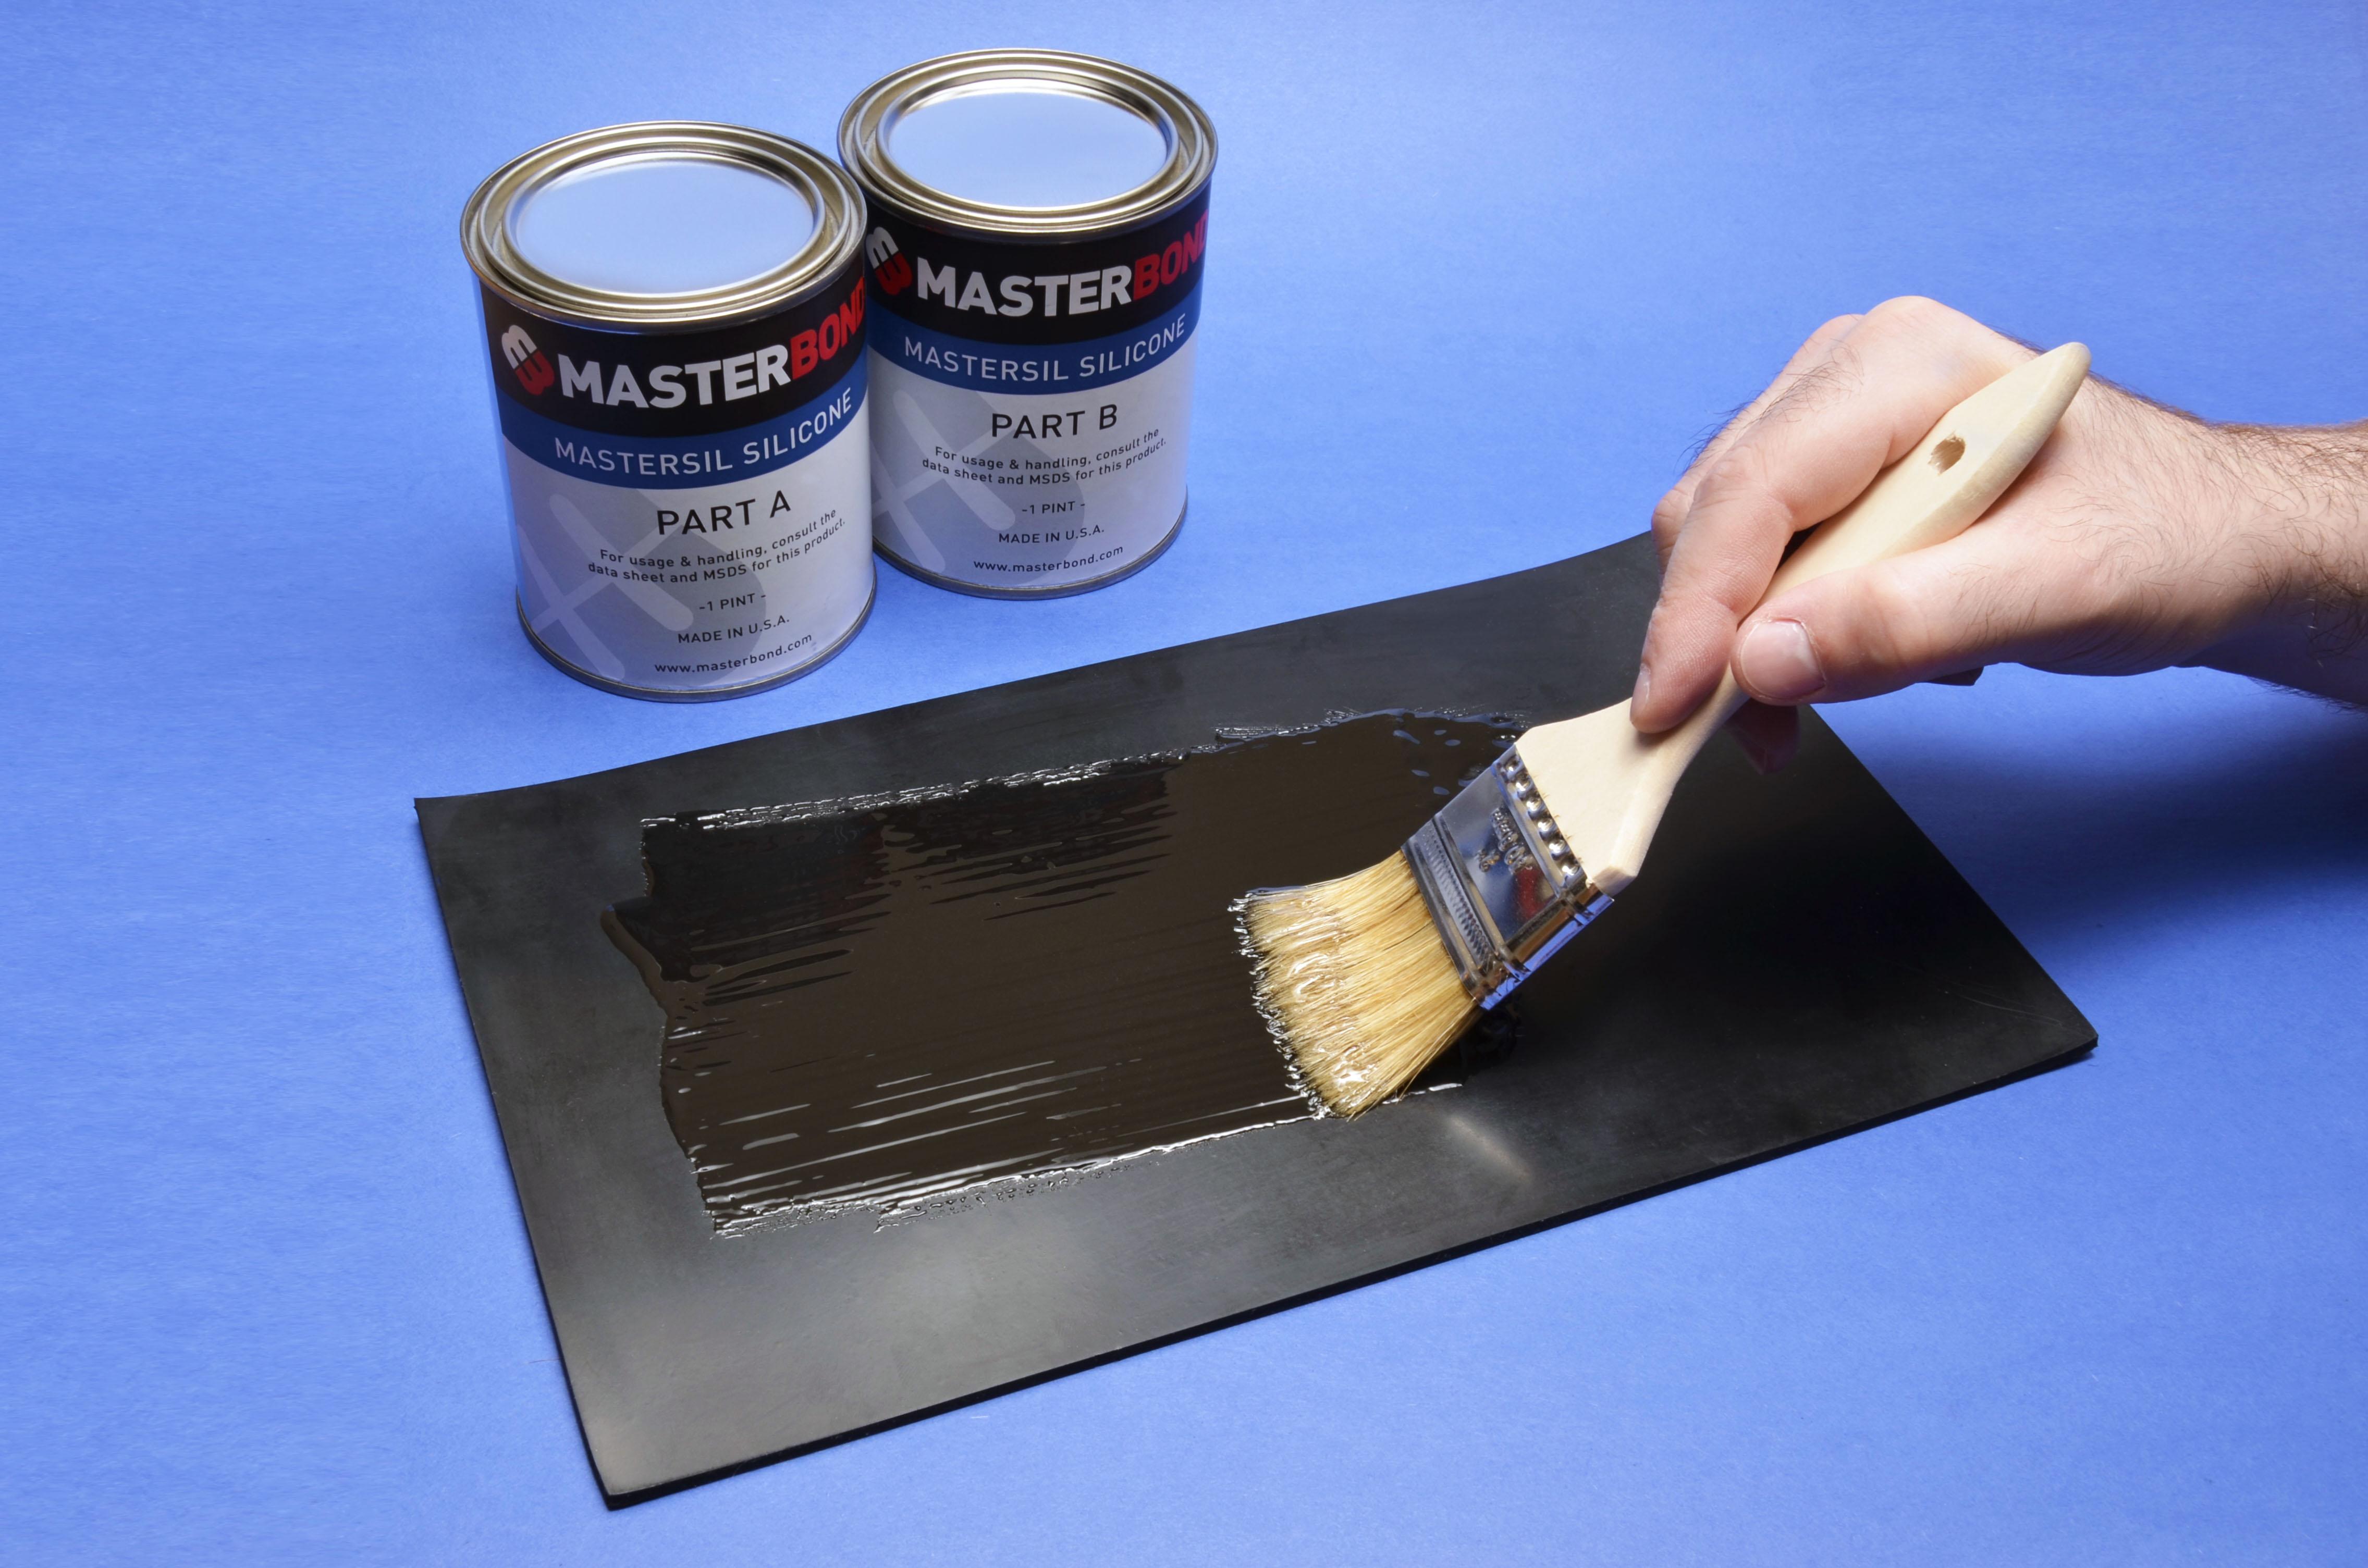 Silicone Elastomers | MasterBond com